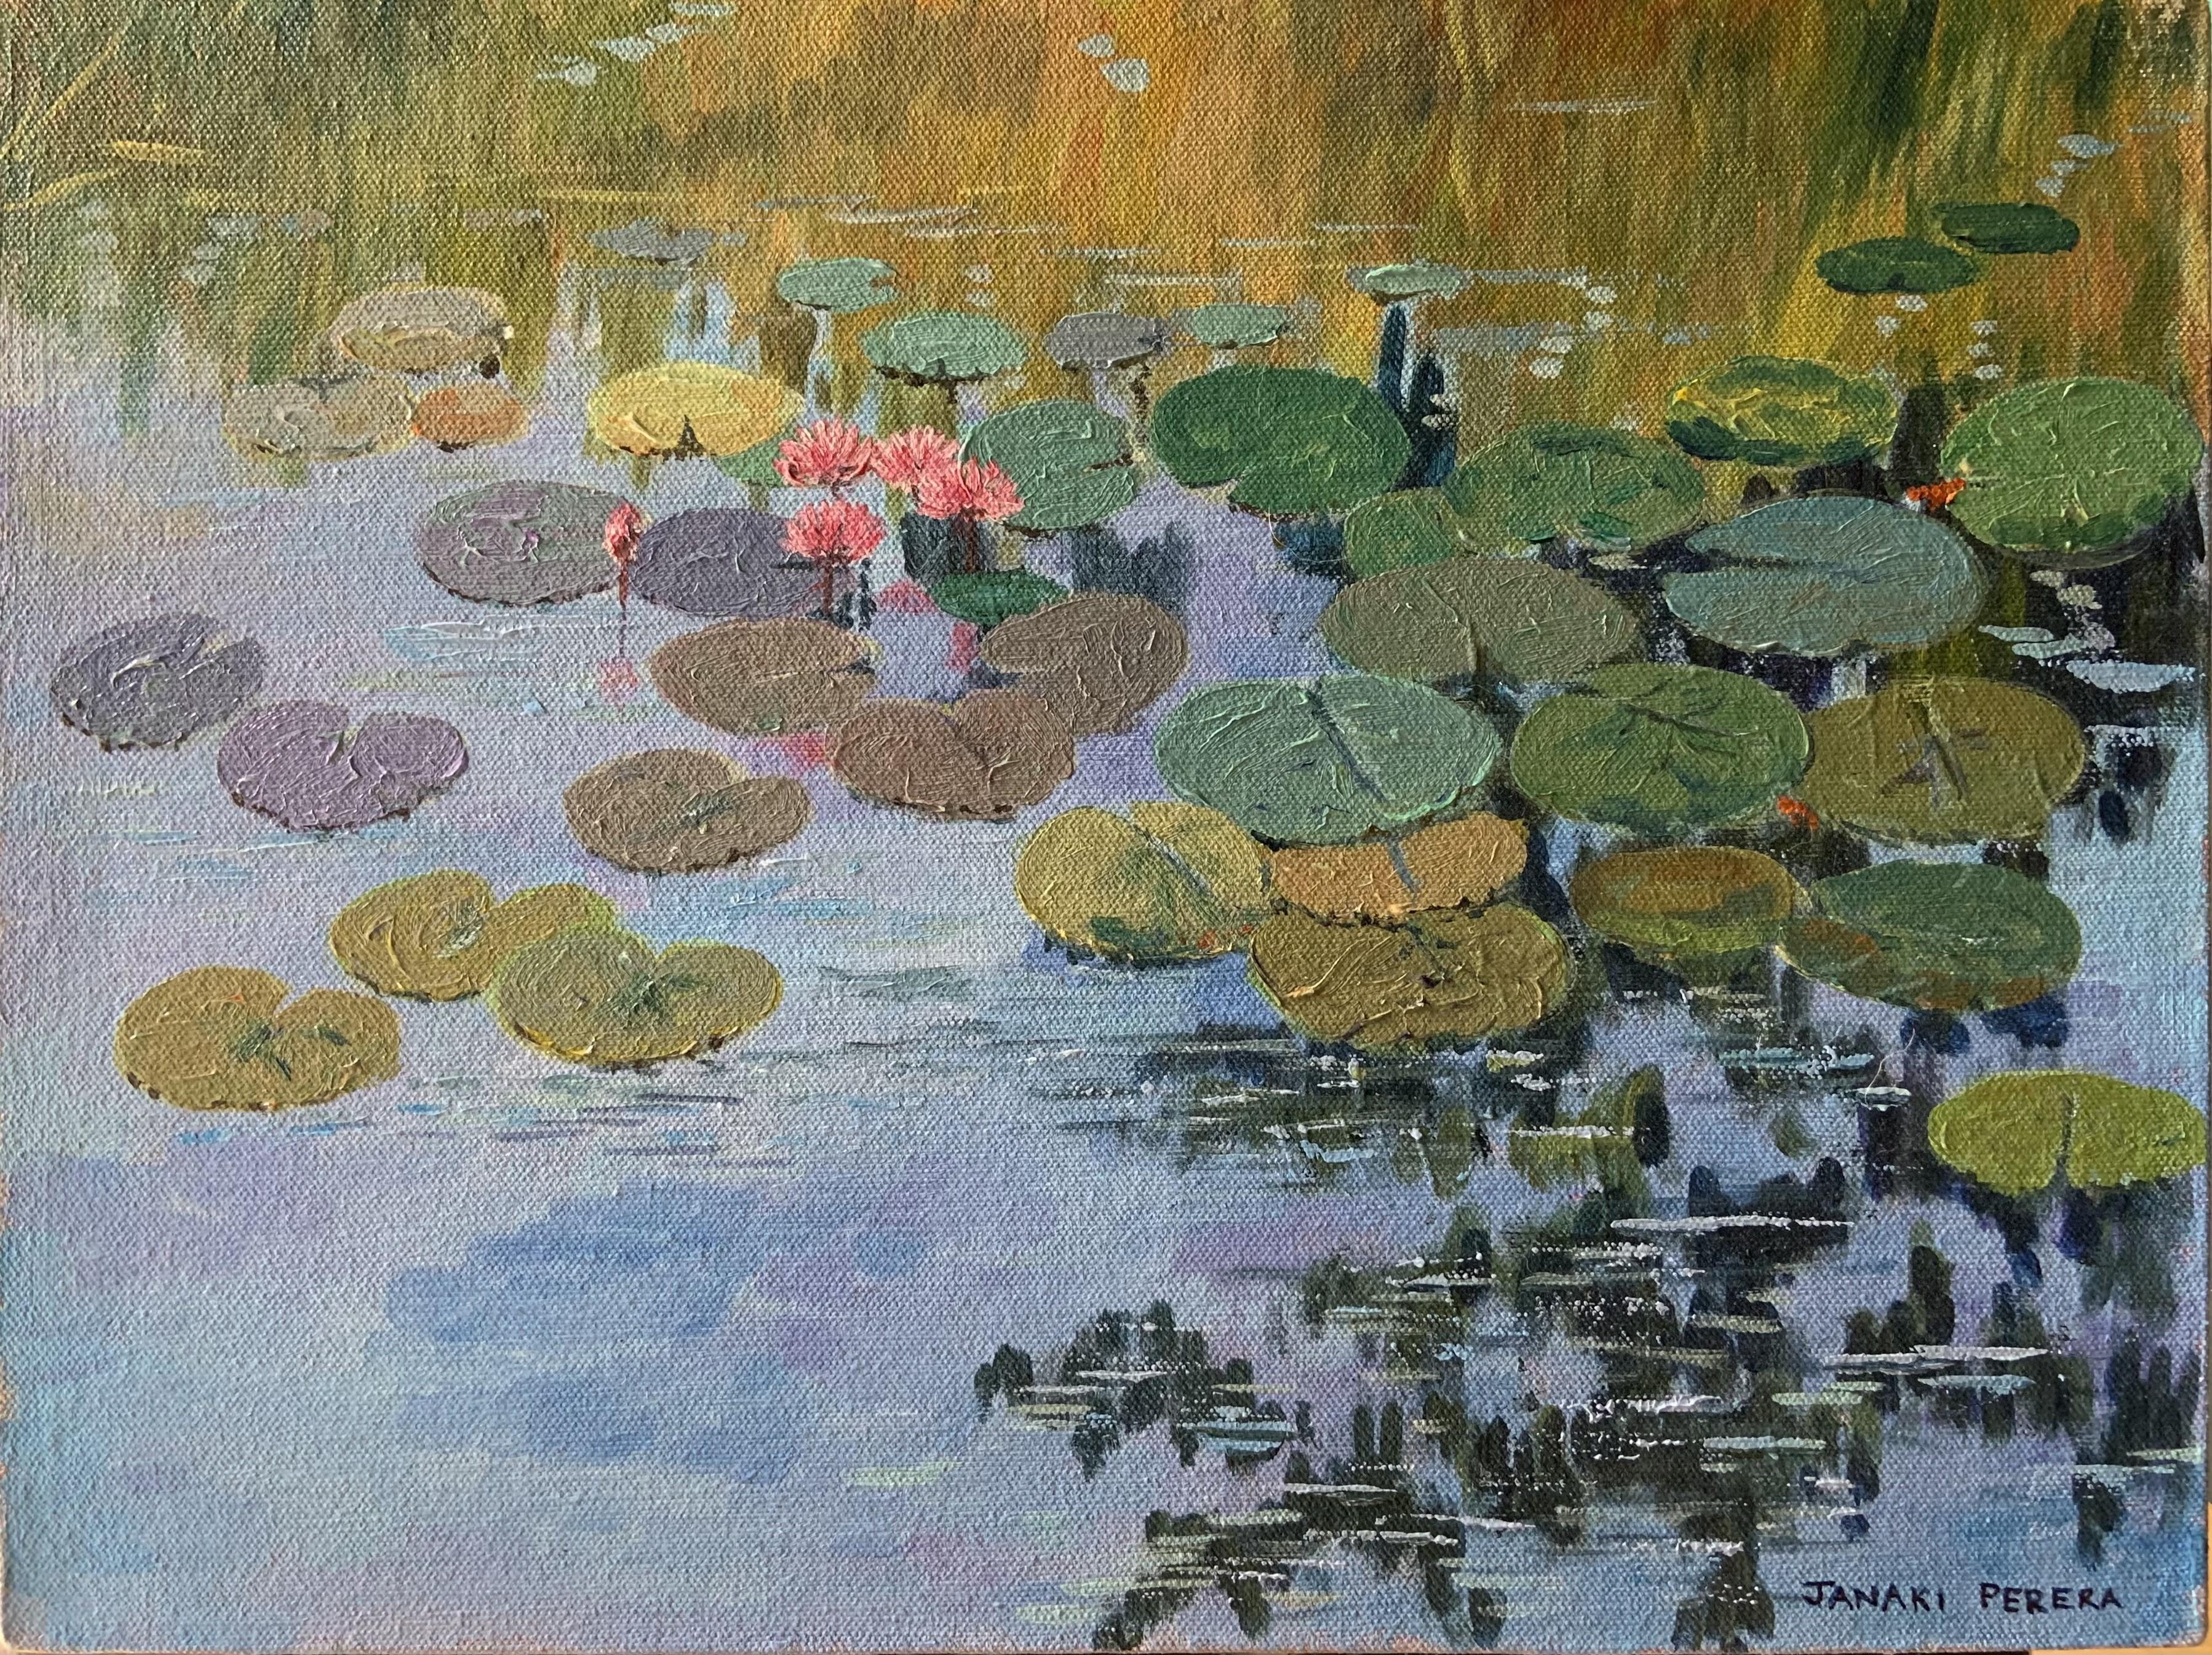 Lotus pond, Sri Lanka by Janaki Perera